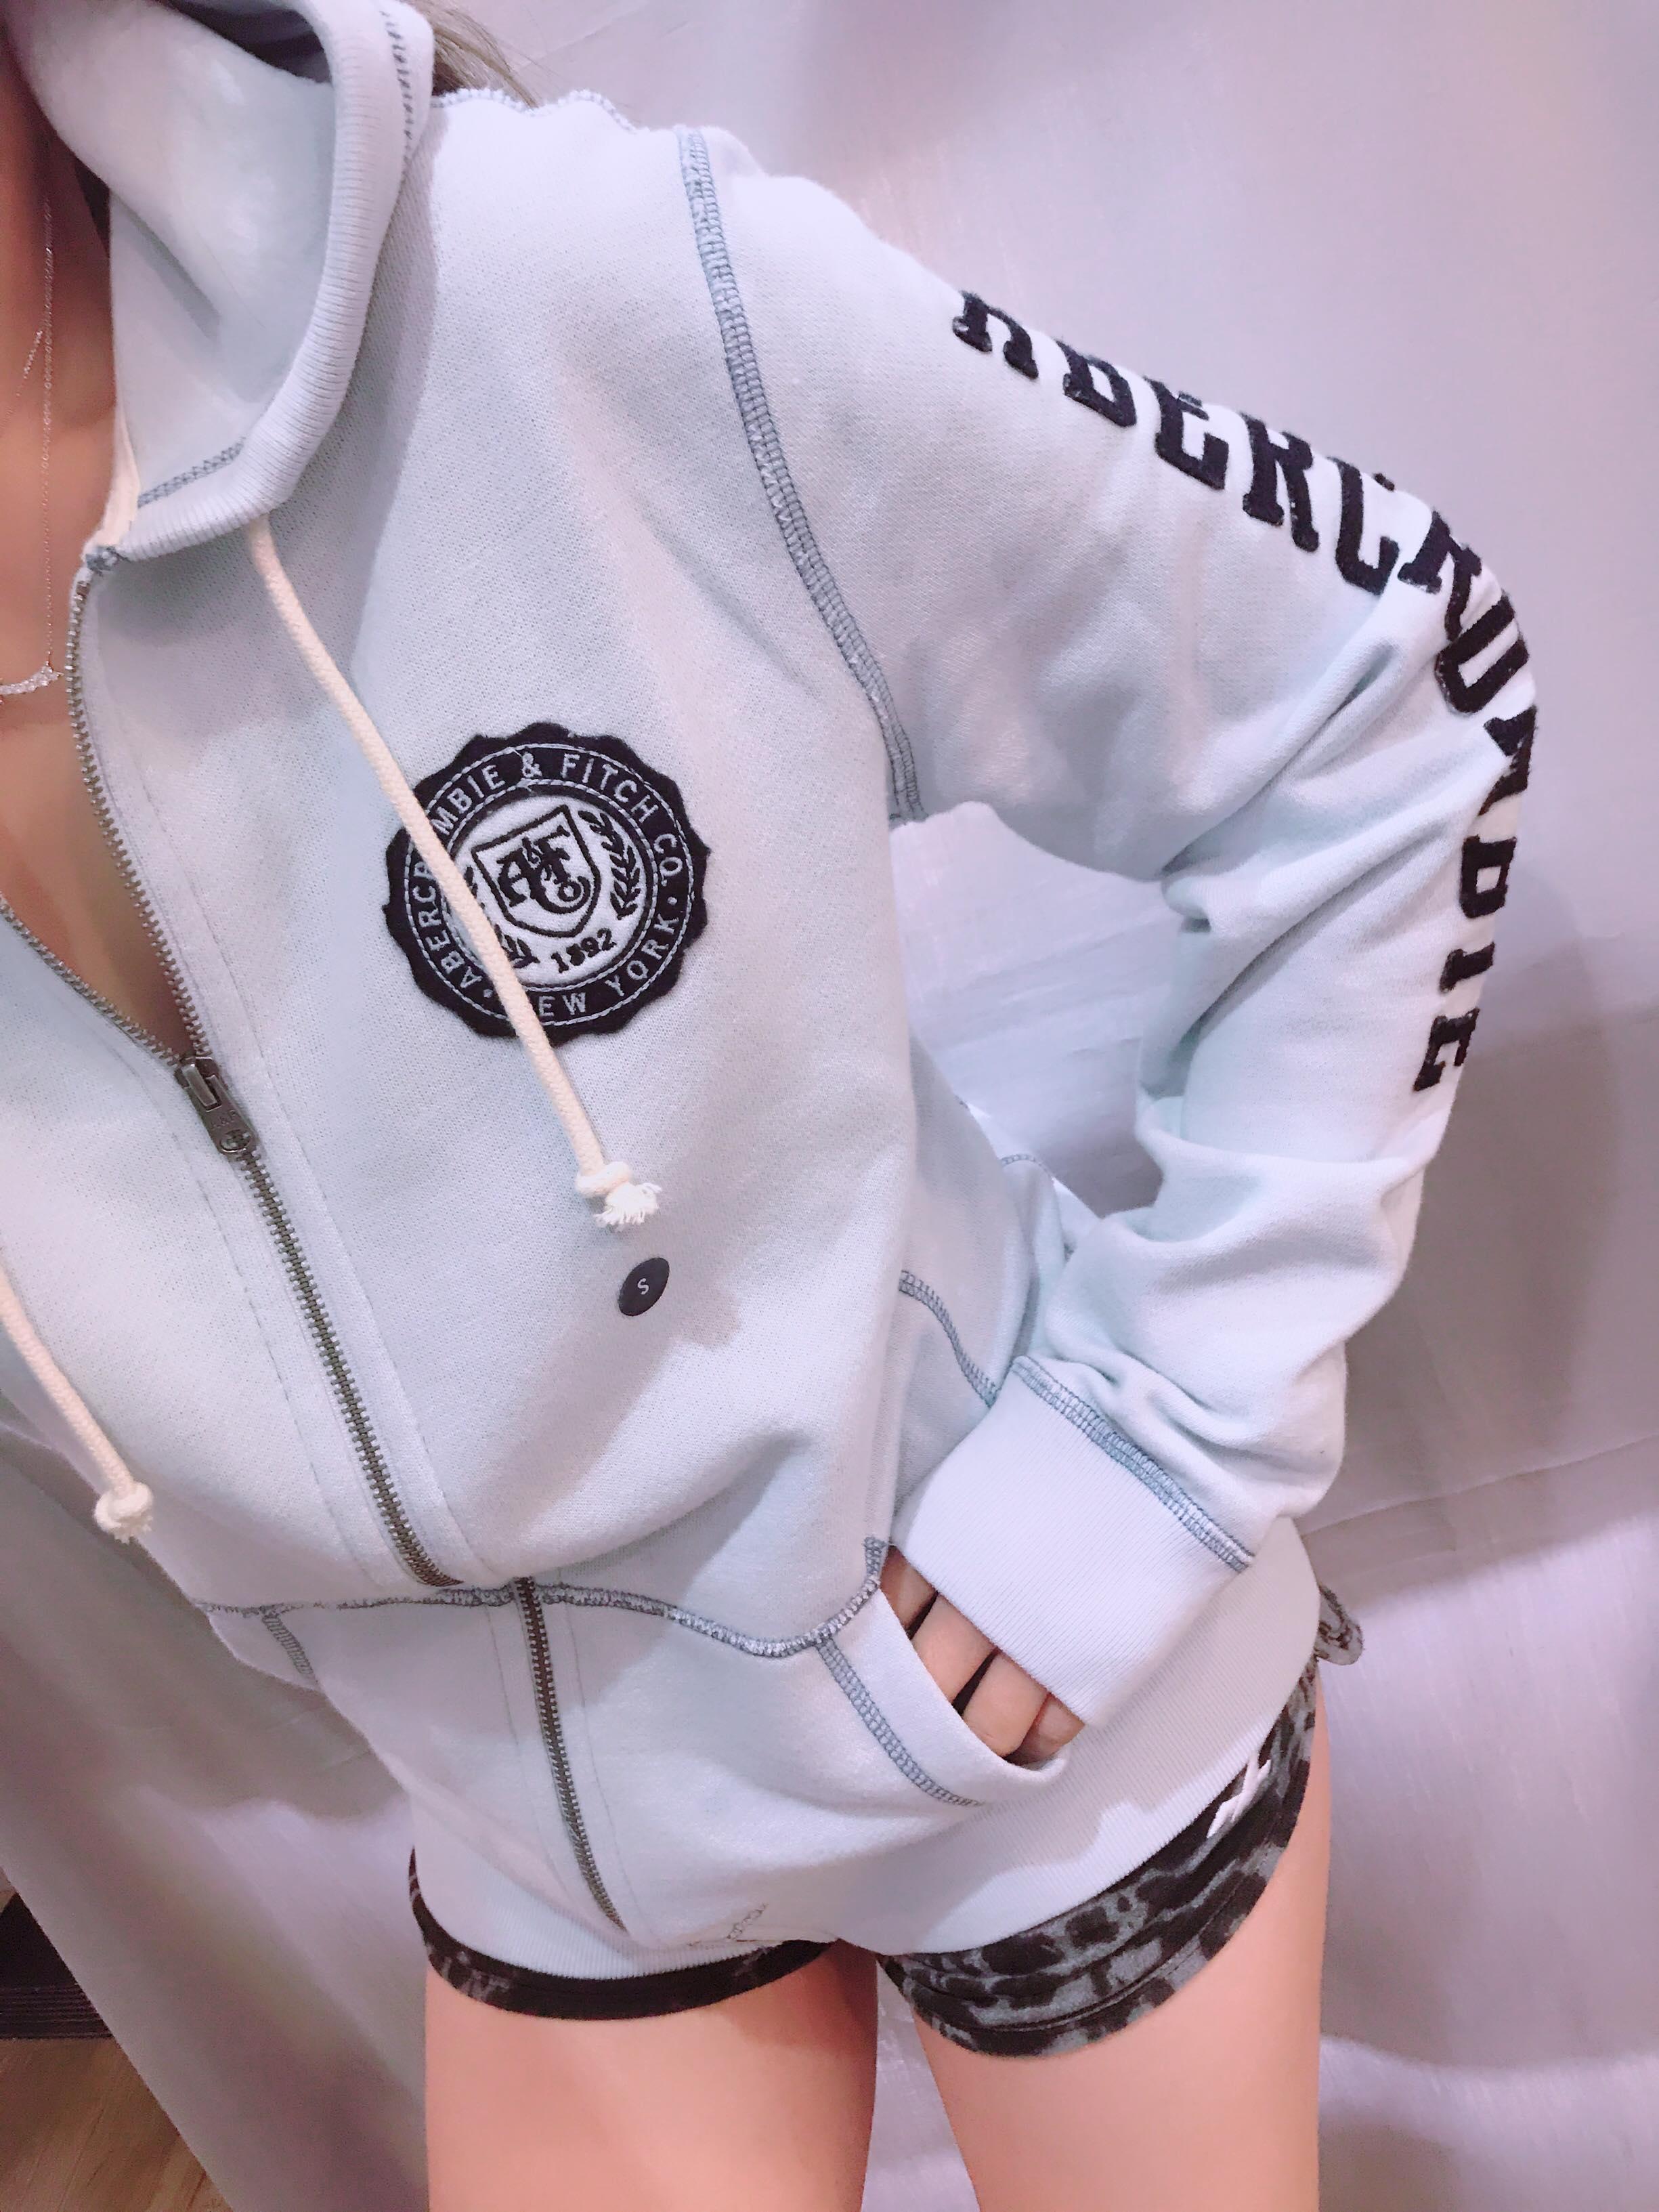 A&F AF Abercrombie & Fitch 春夏 圖樣 全拉鍊式 帽衫 麋鹿公主 歐美時尚 平行輸入精品店